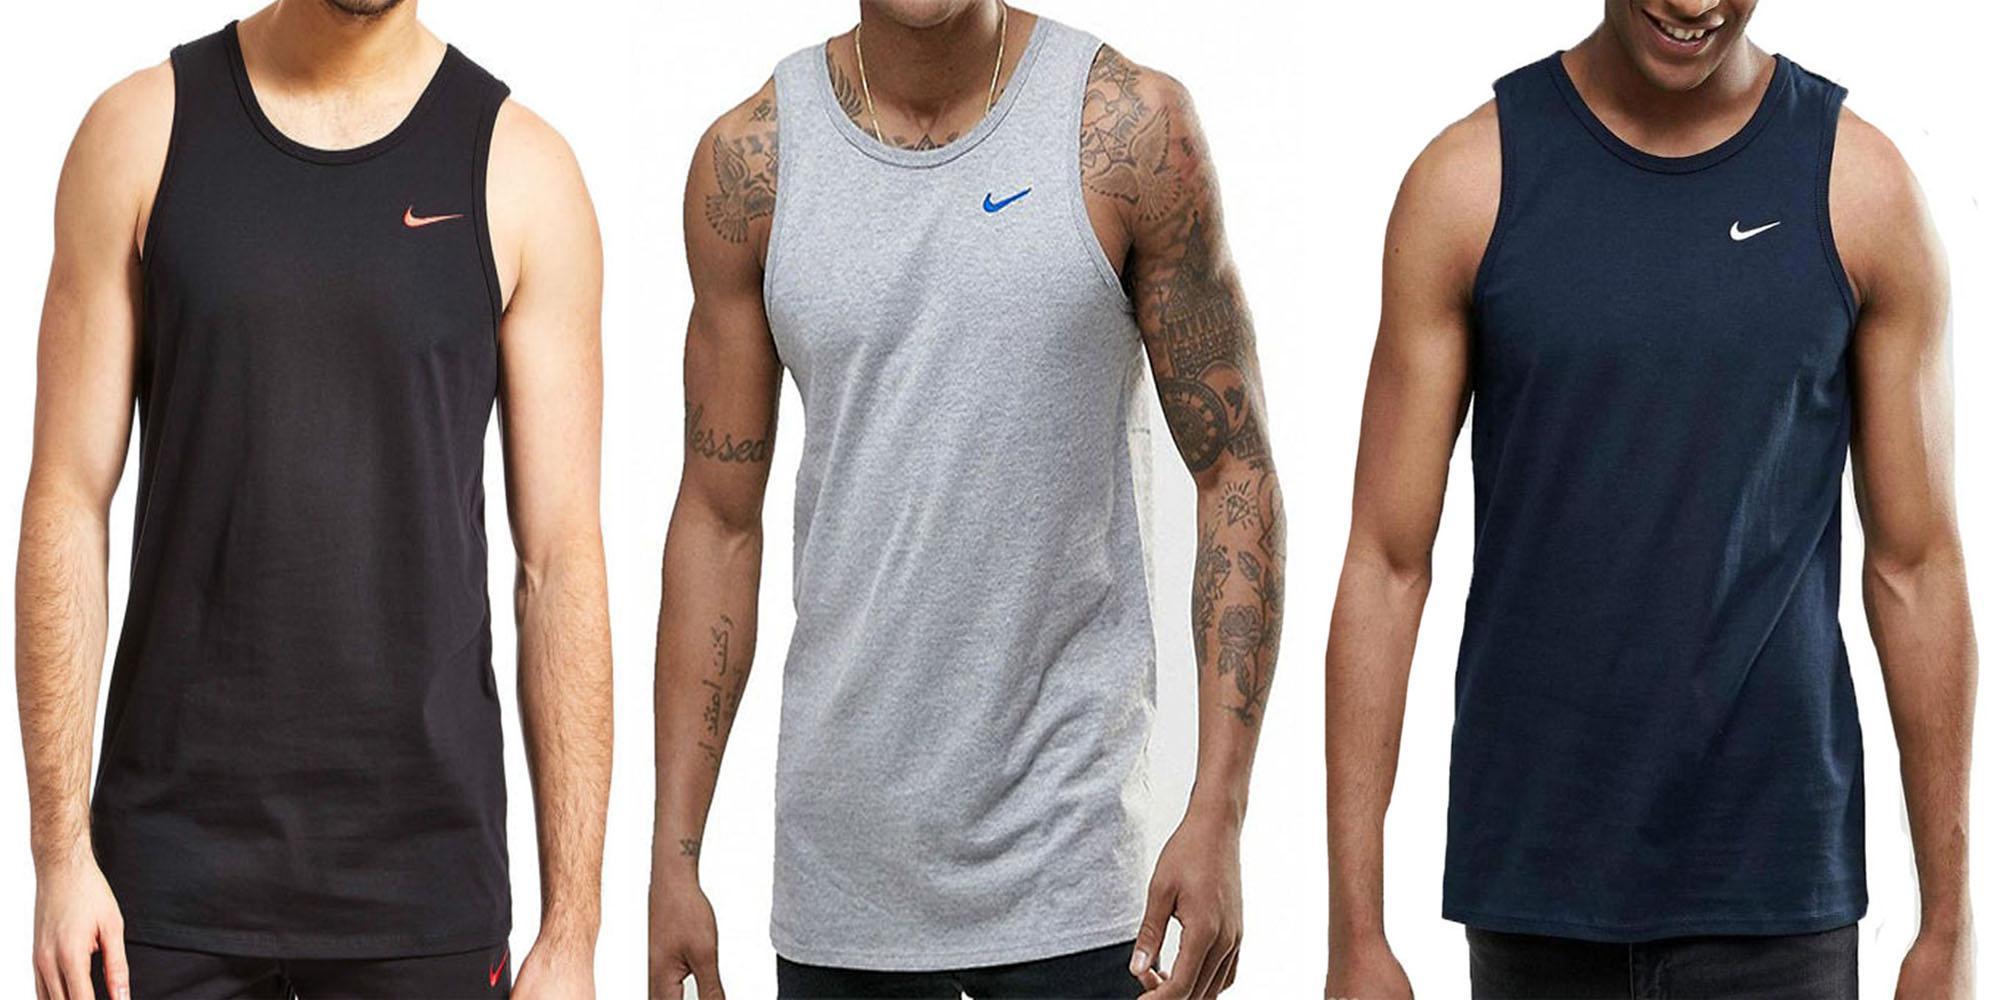 Superficial cráneo cajón  Nike Swoosh Hombre Negro Gris Camiseta Azul Retro SPORTS Gym sin Mangas  Tanque | eBay